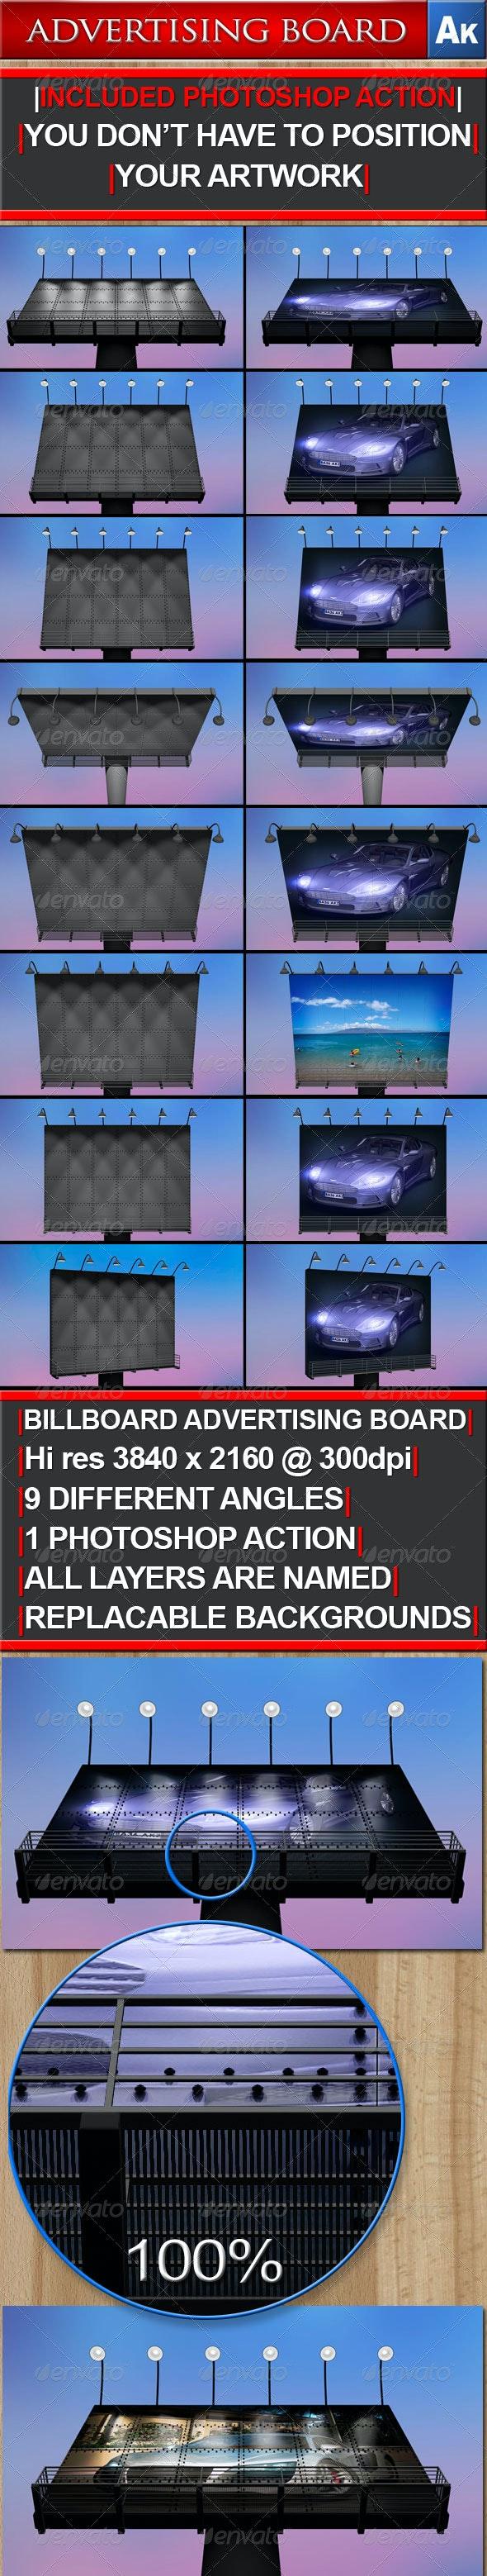 Billboard, Advertising Board - Signage Print